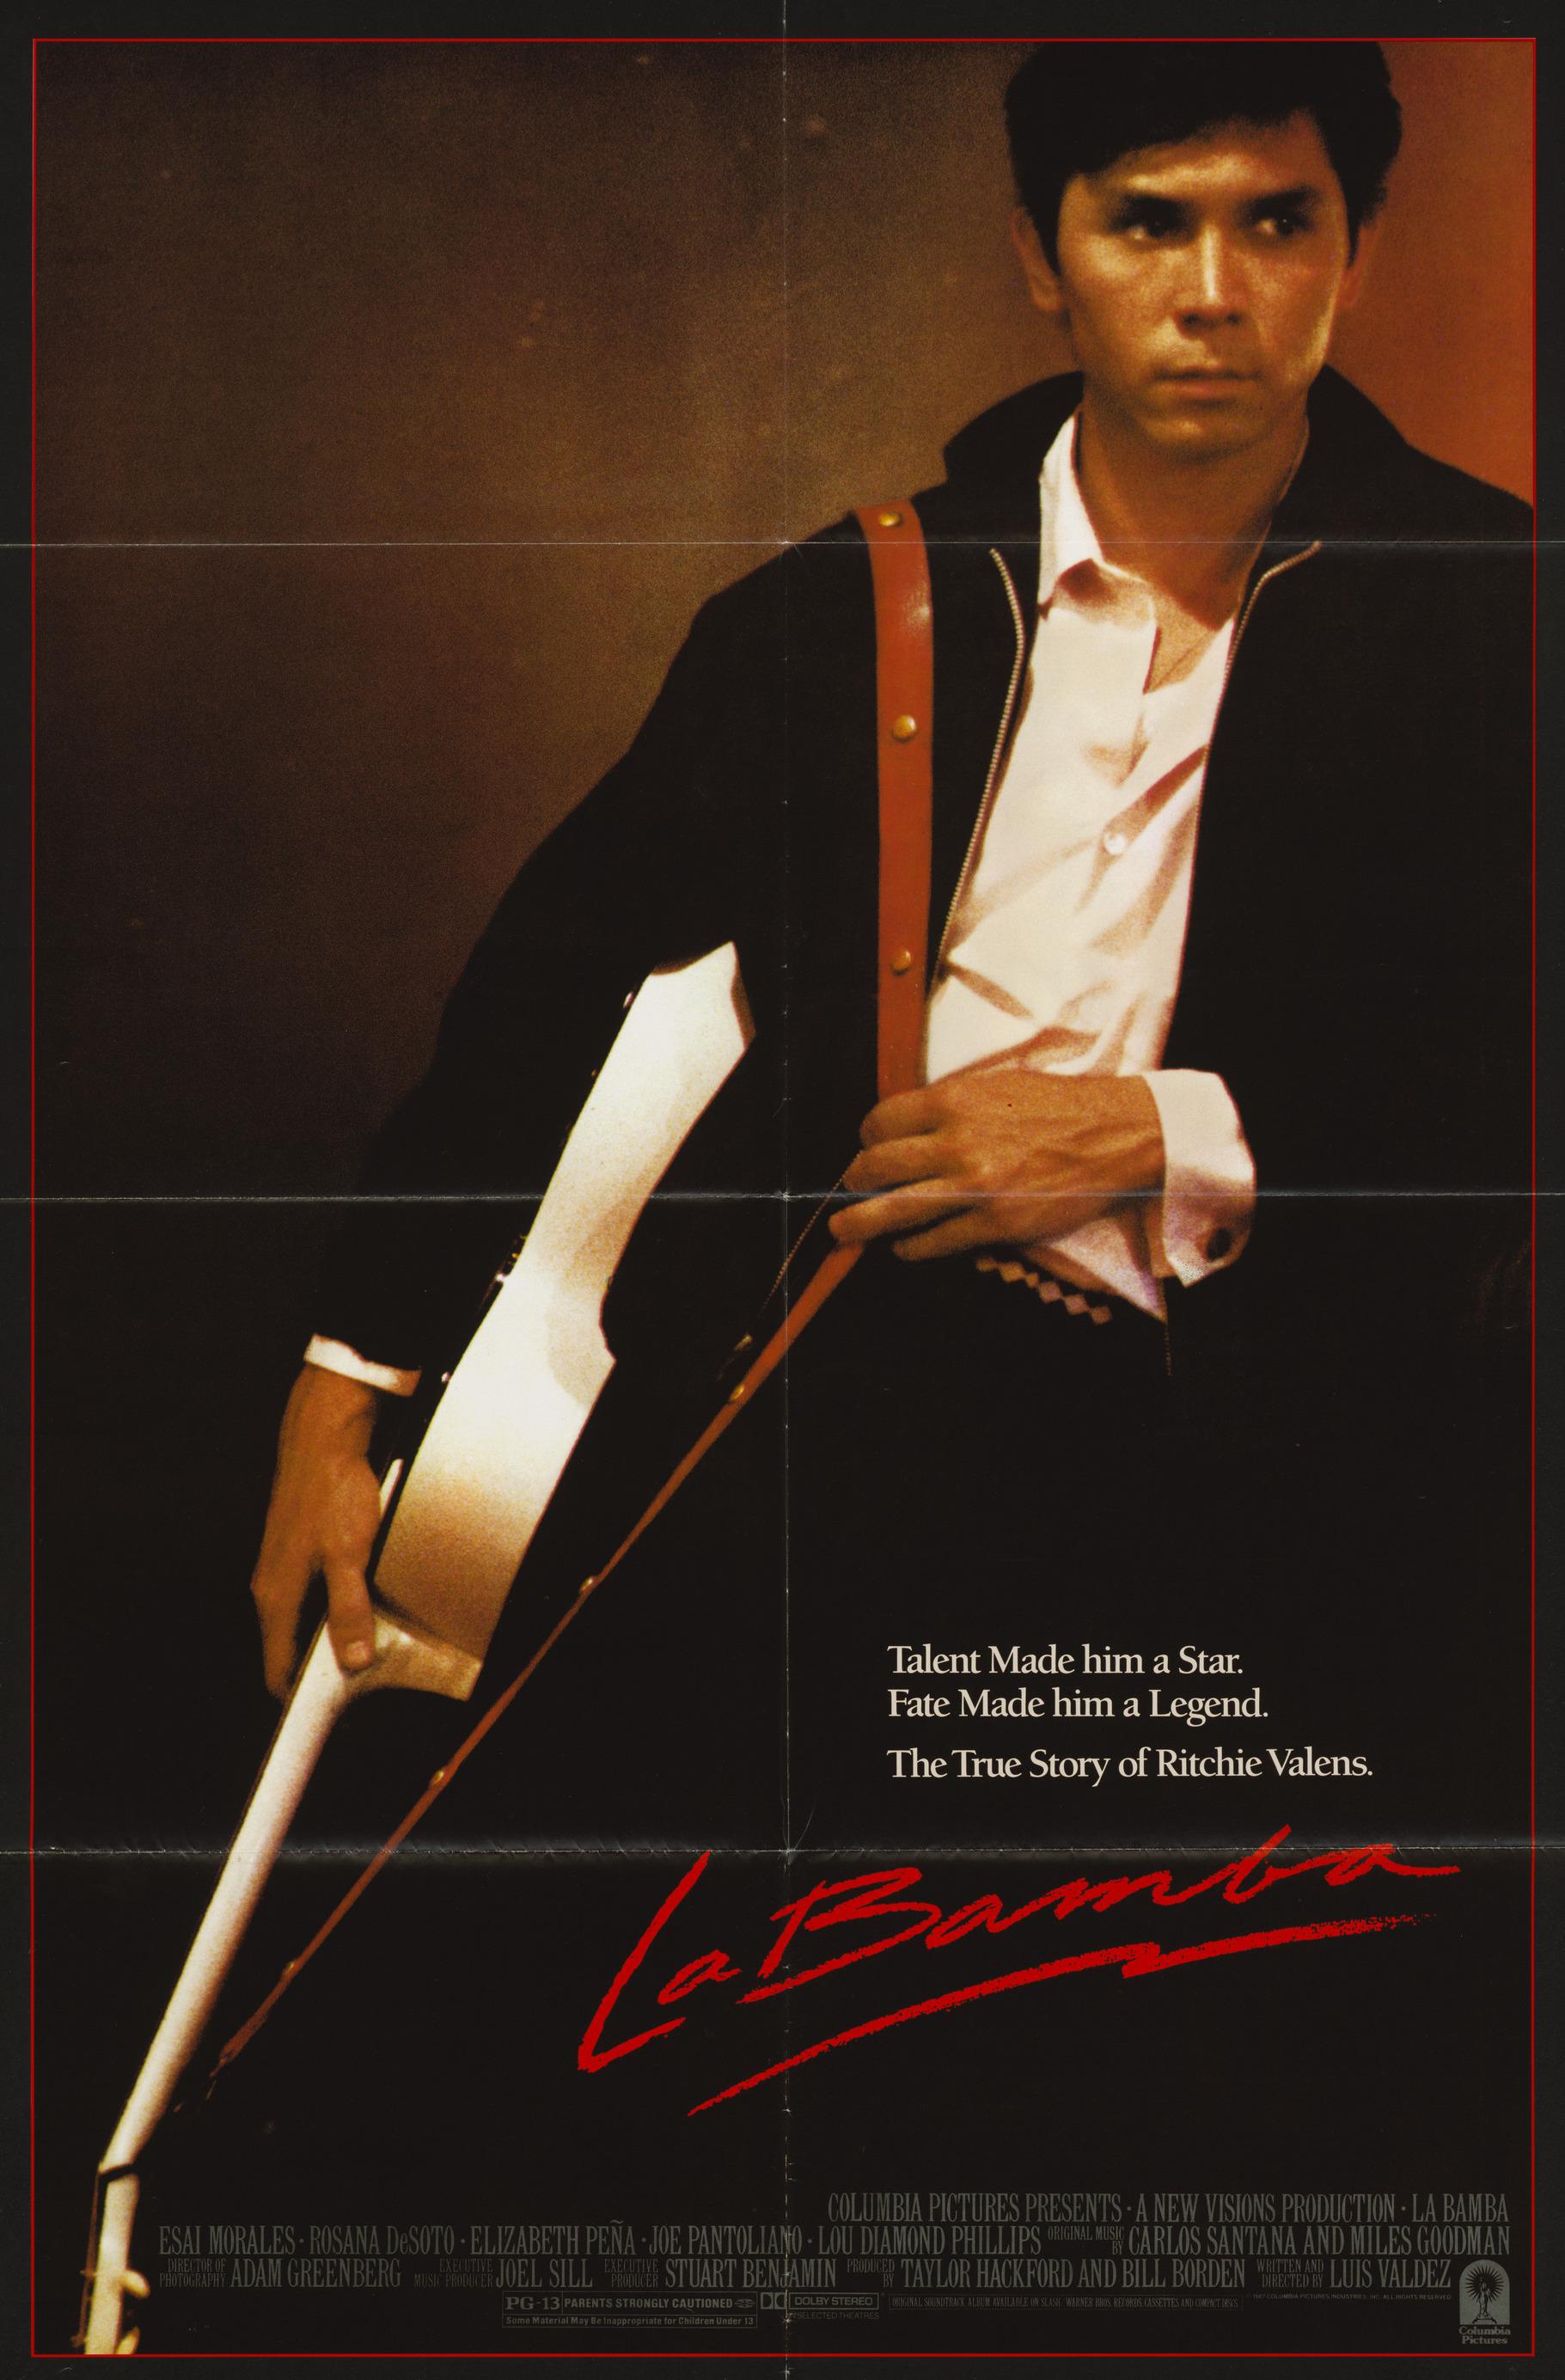 LA BAMBA (1987) – 30th Anniversary